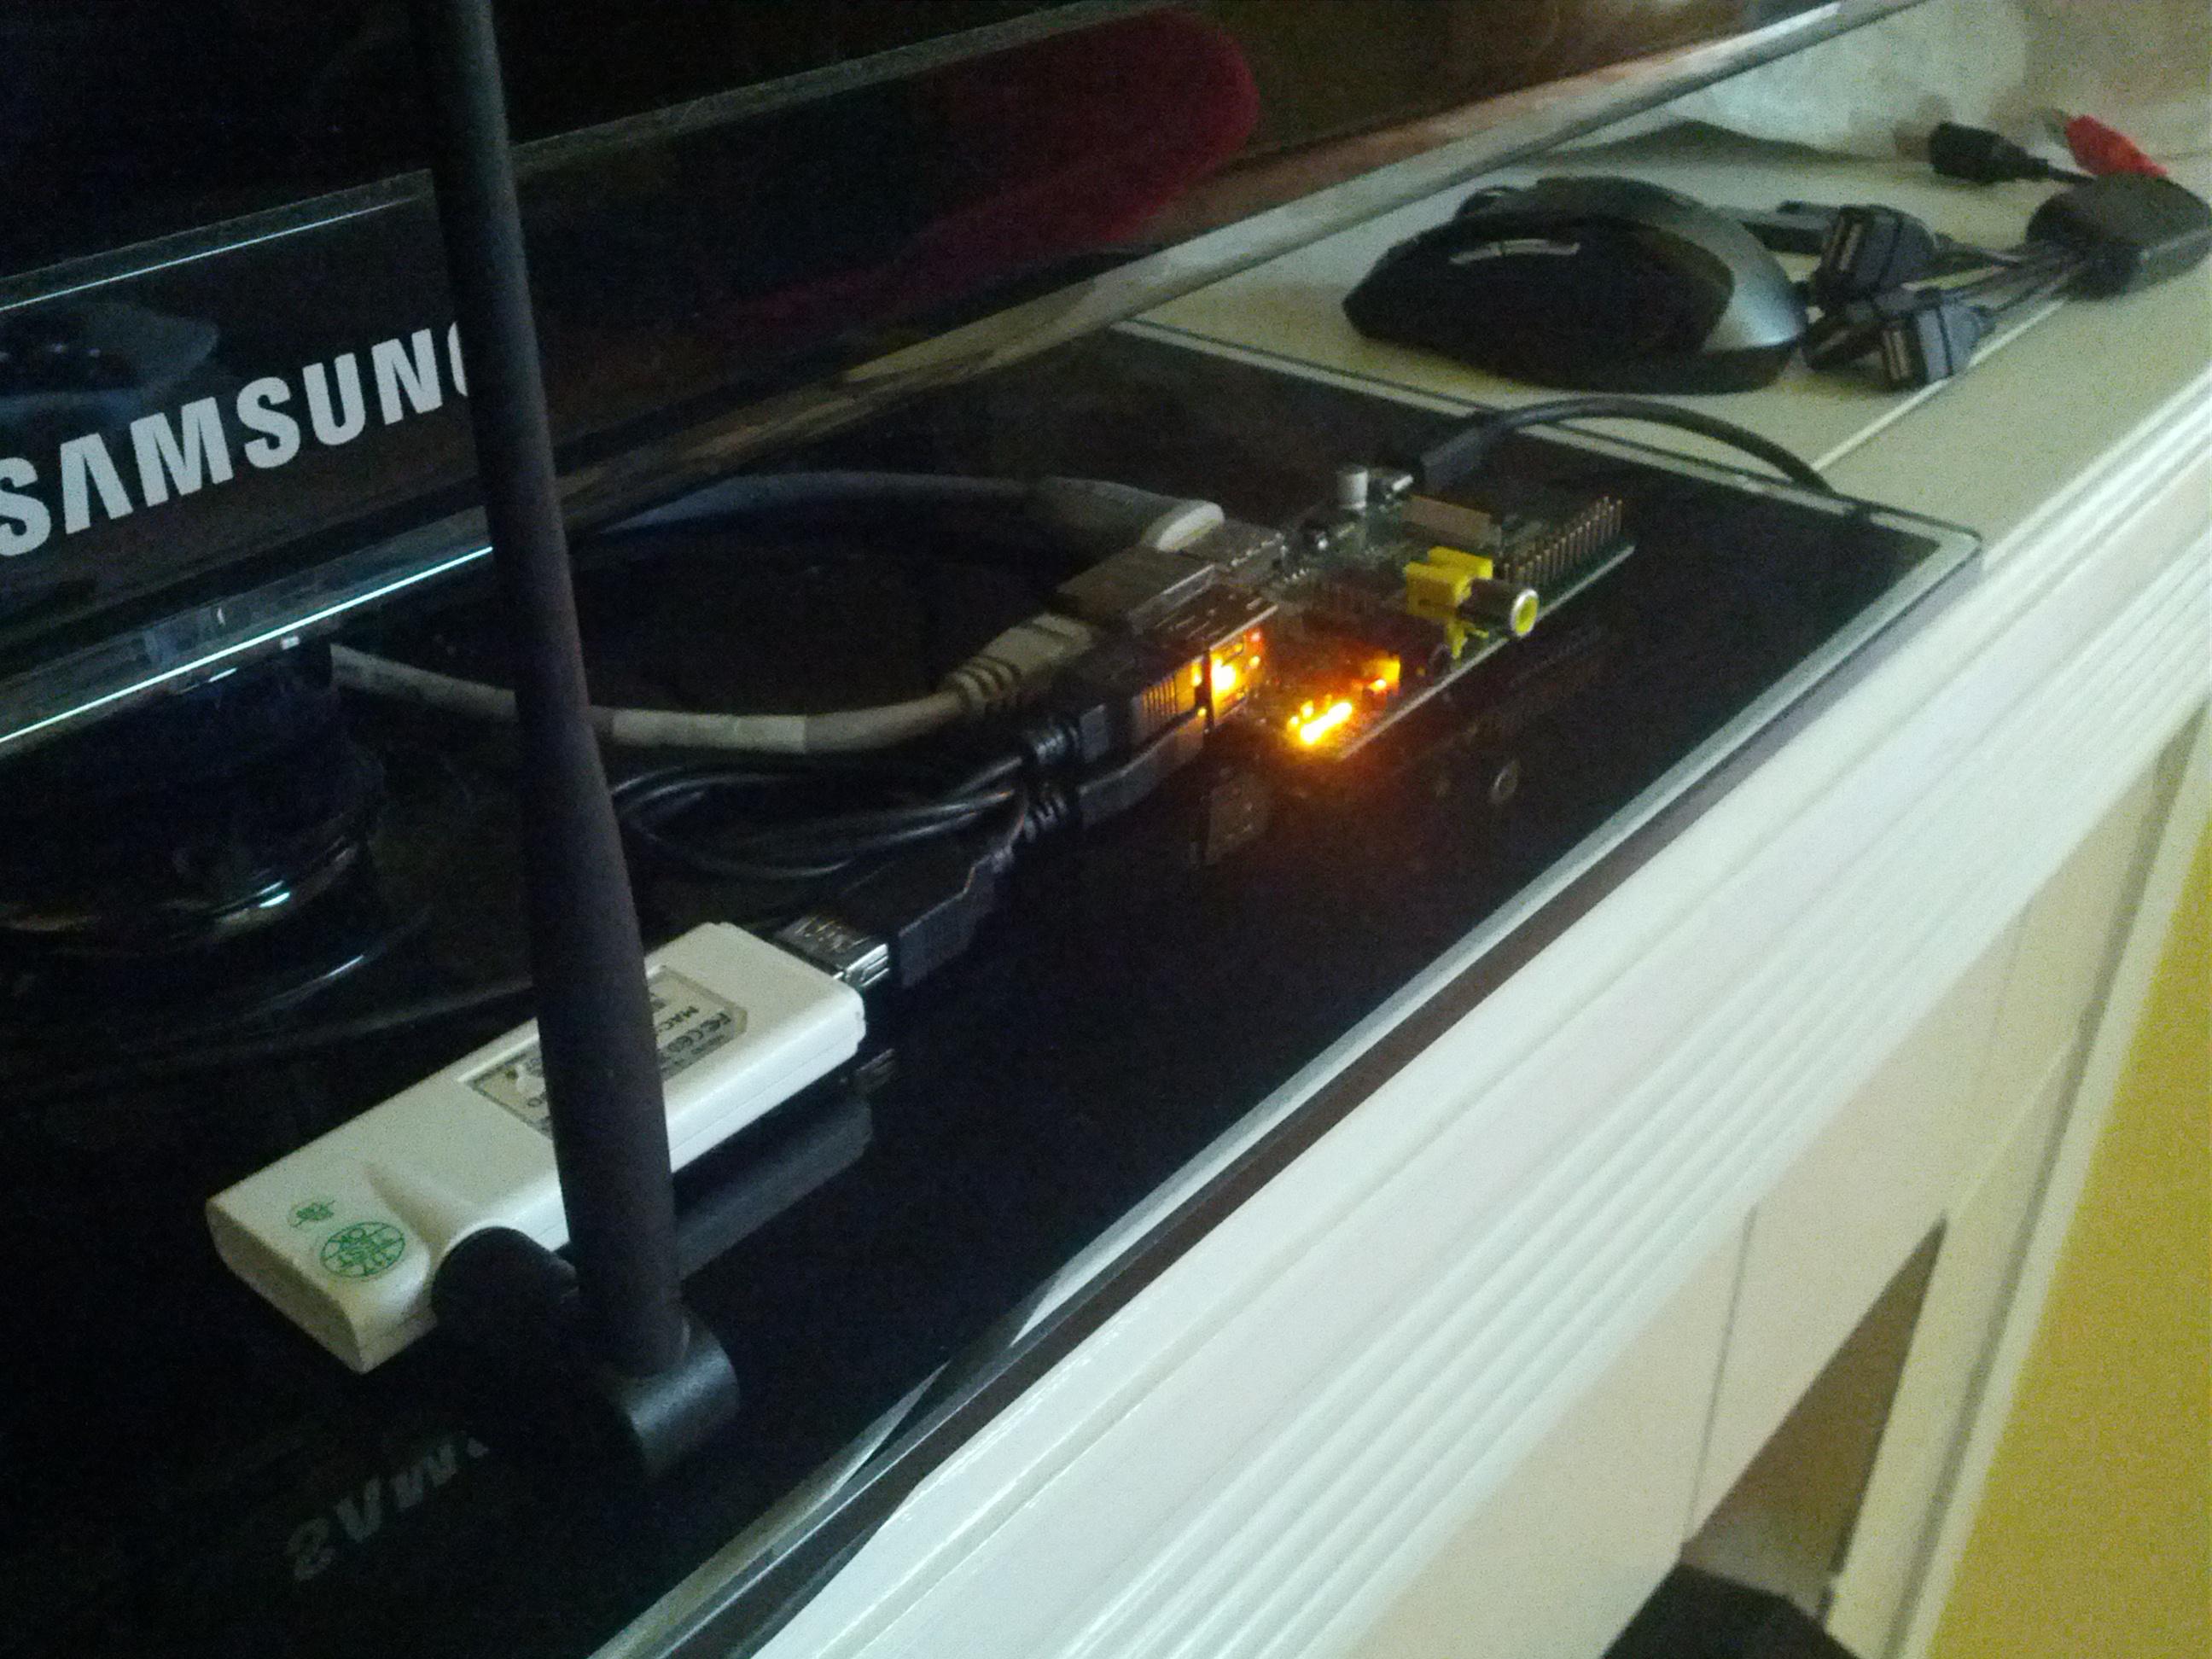 Ralink/Realtek Wireless Dongle (rt3070) on the Raspberry Pi